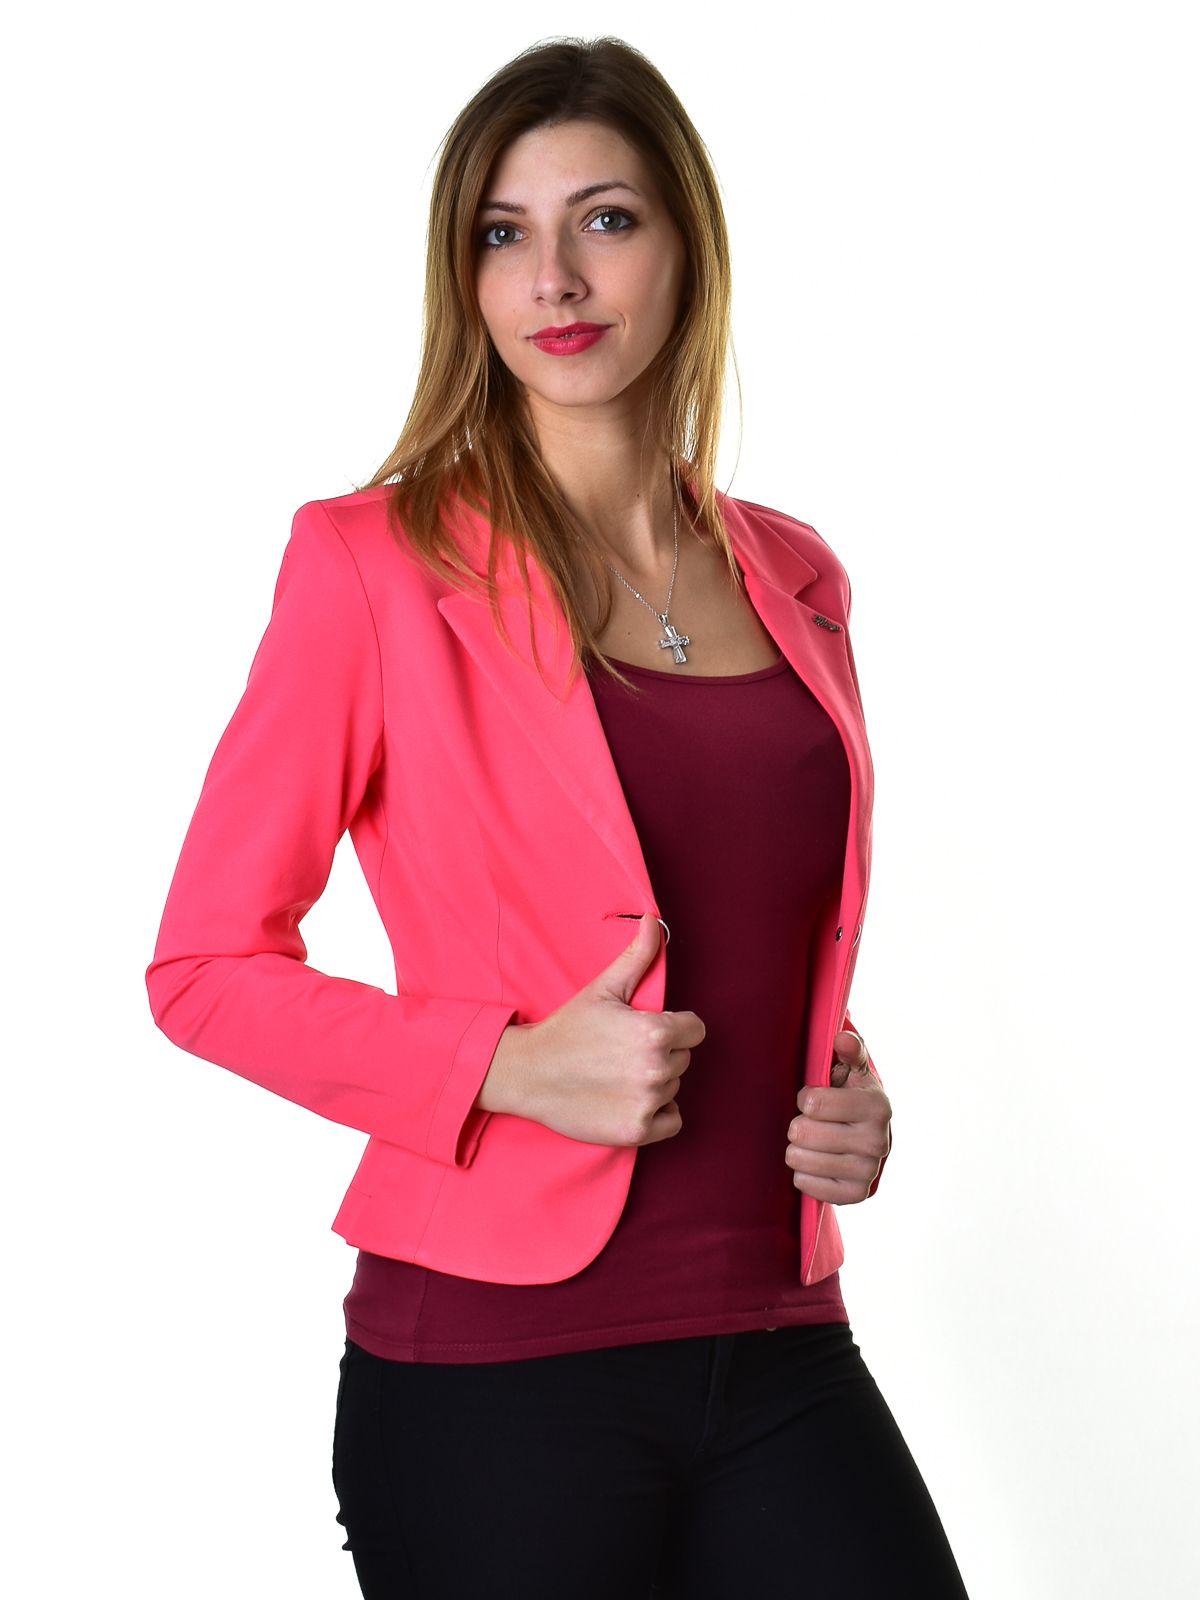 42d2fef2b0 Mayo Chix női blézer DIANE | Markasbolt.hu Hivatalos Mayo Chix ...